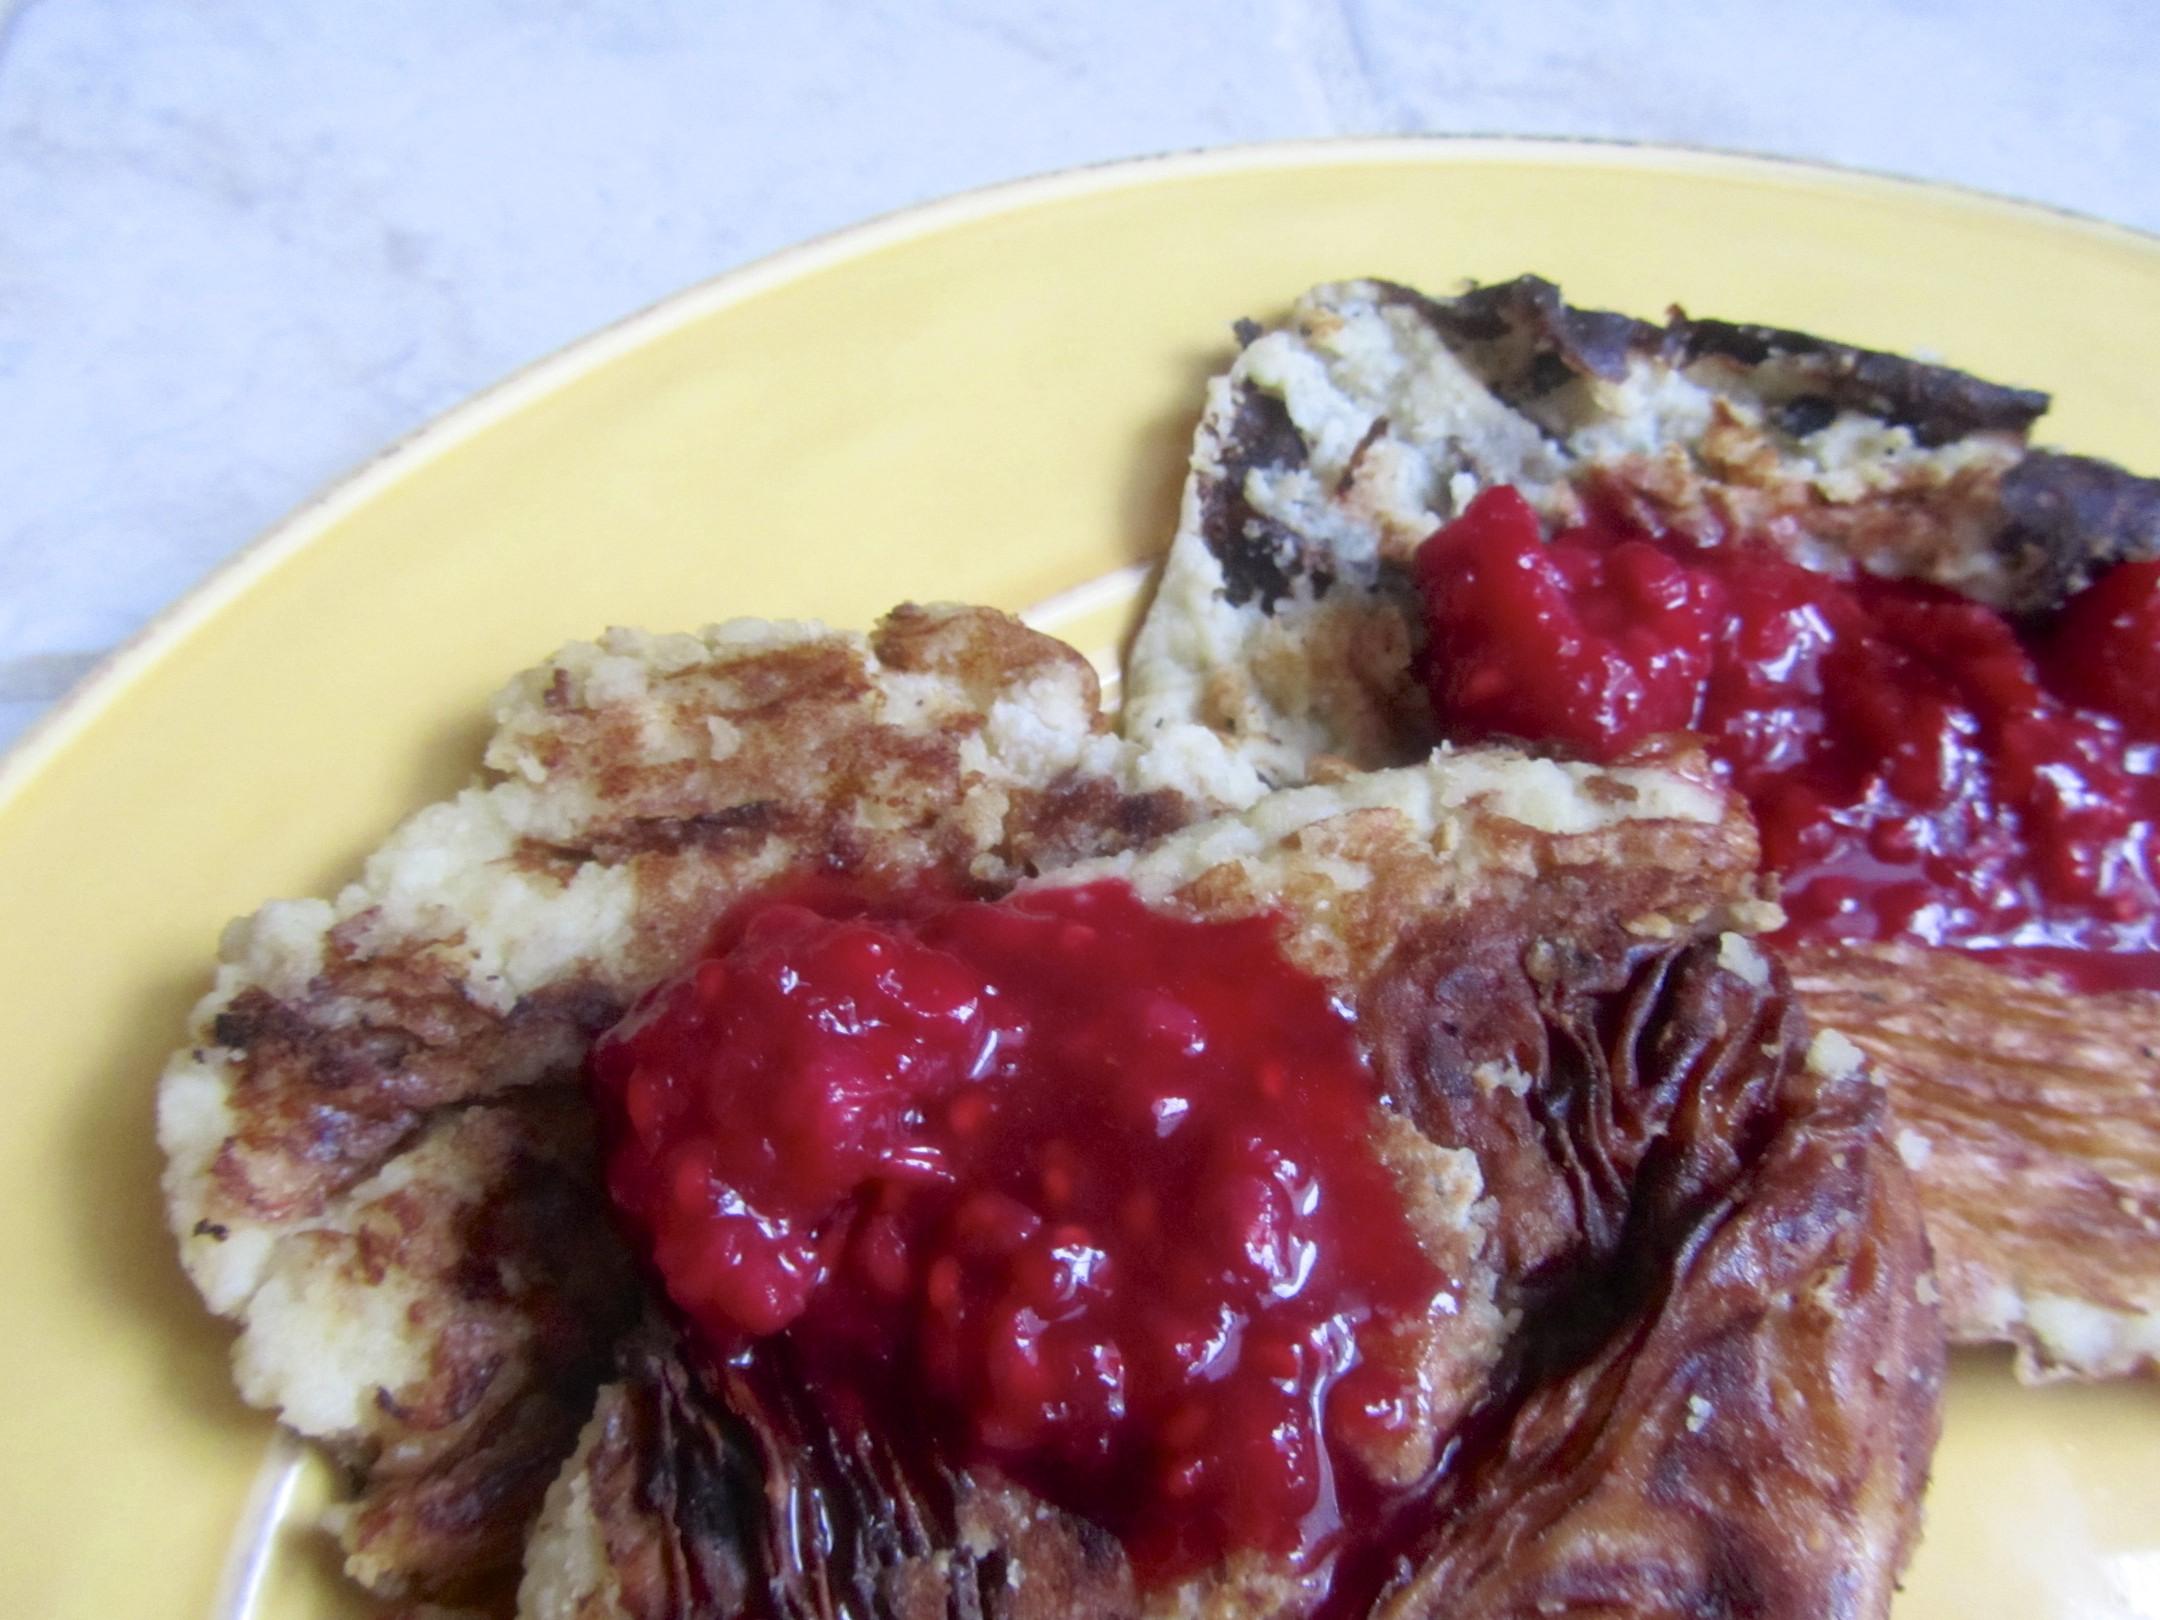 Almond Meal Pancakes